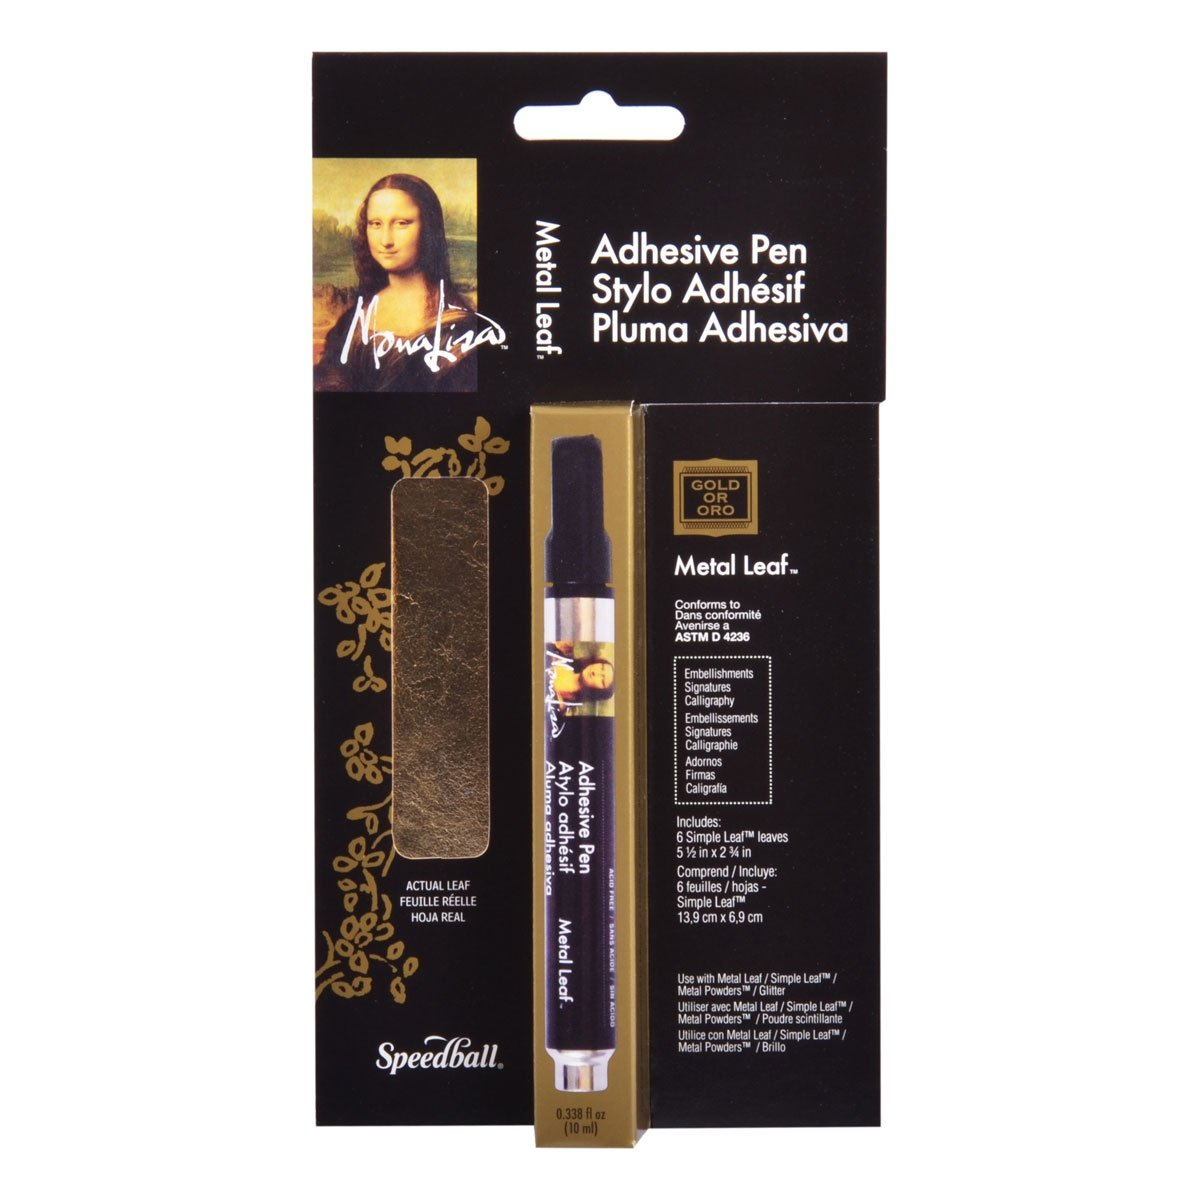 Speedball Mona Lisa Adhesive Pen for Metal Leaf Kit w/Gold Simple Leaf